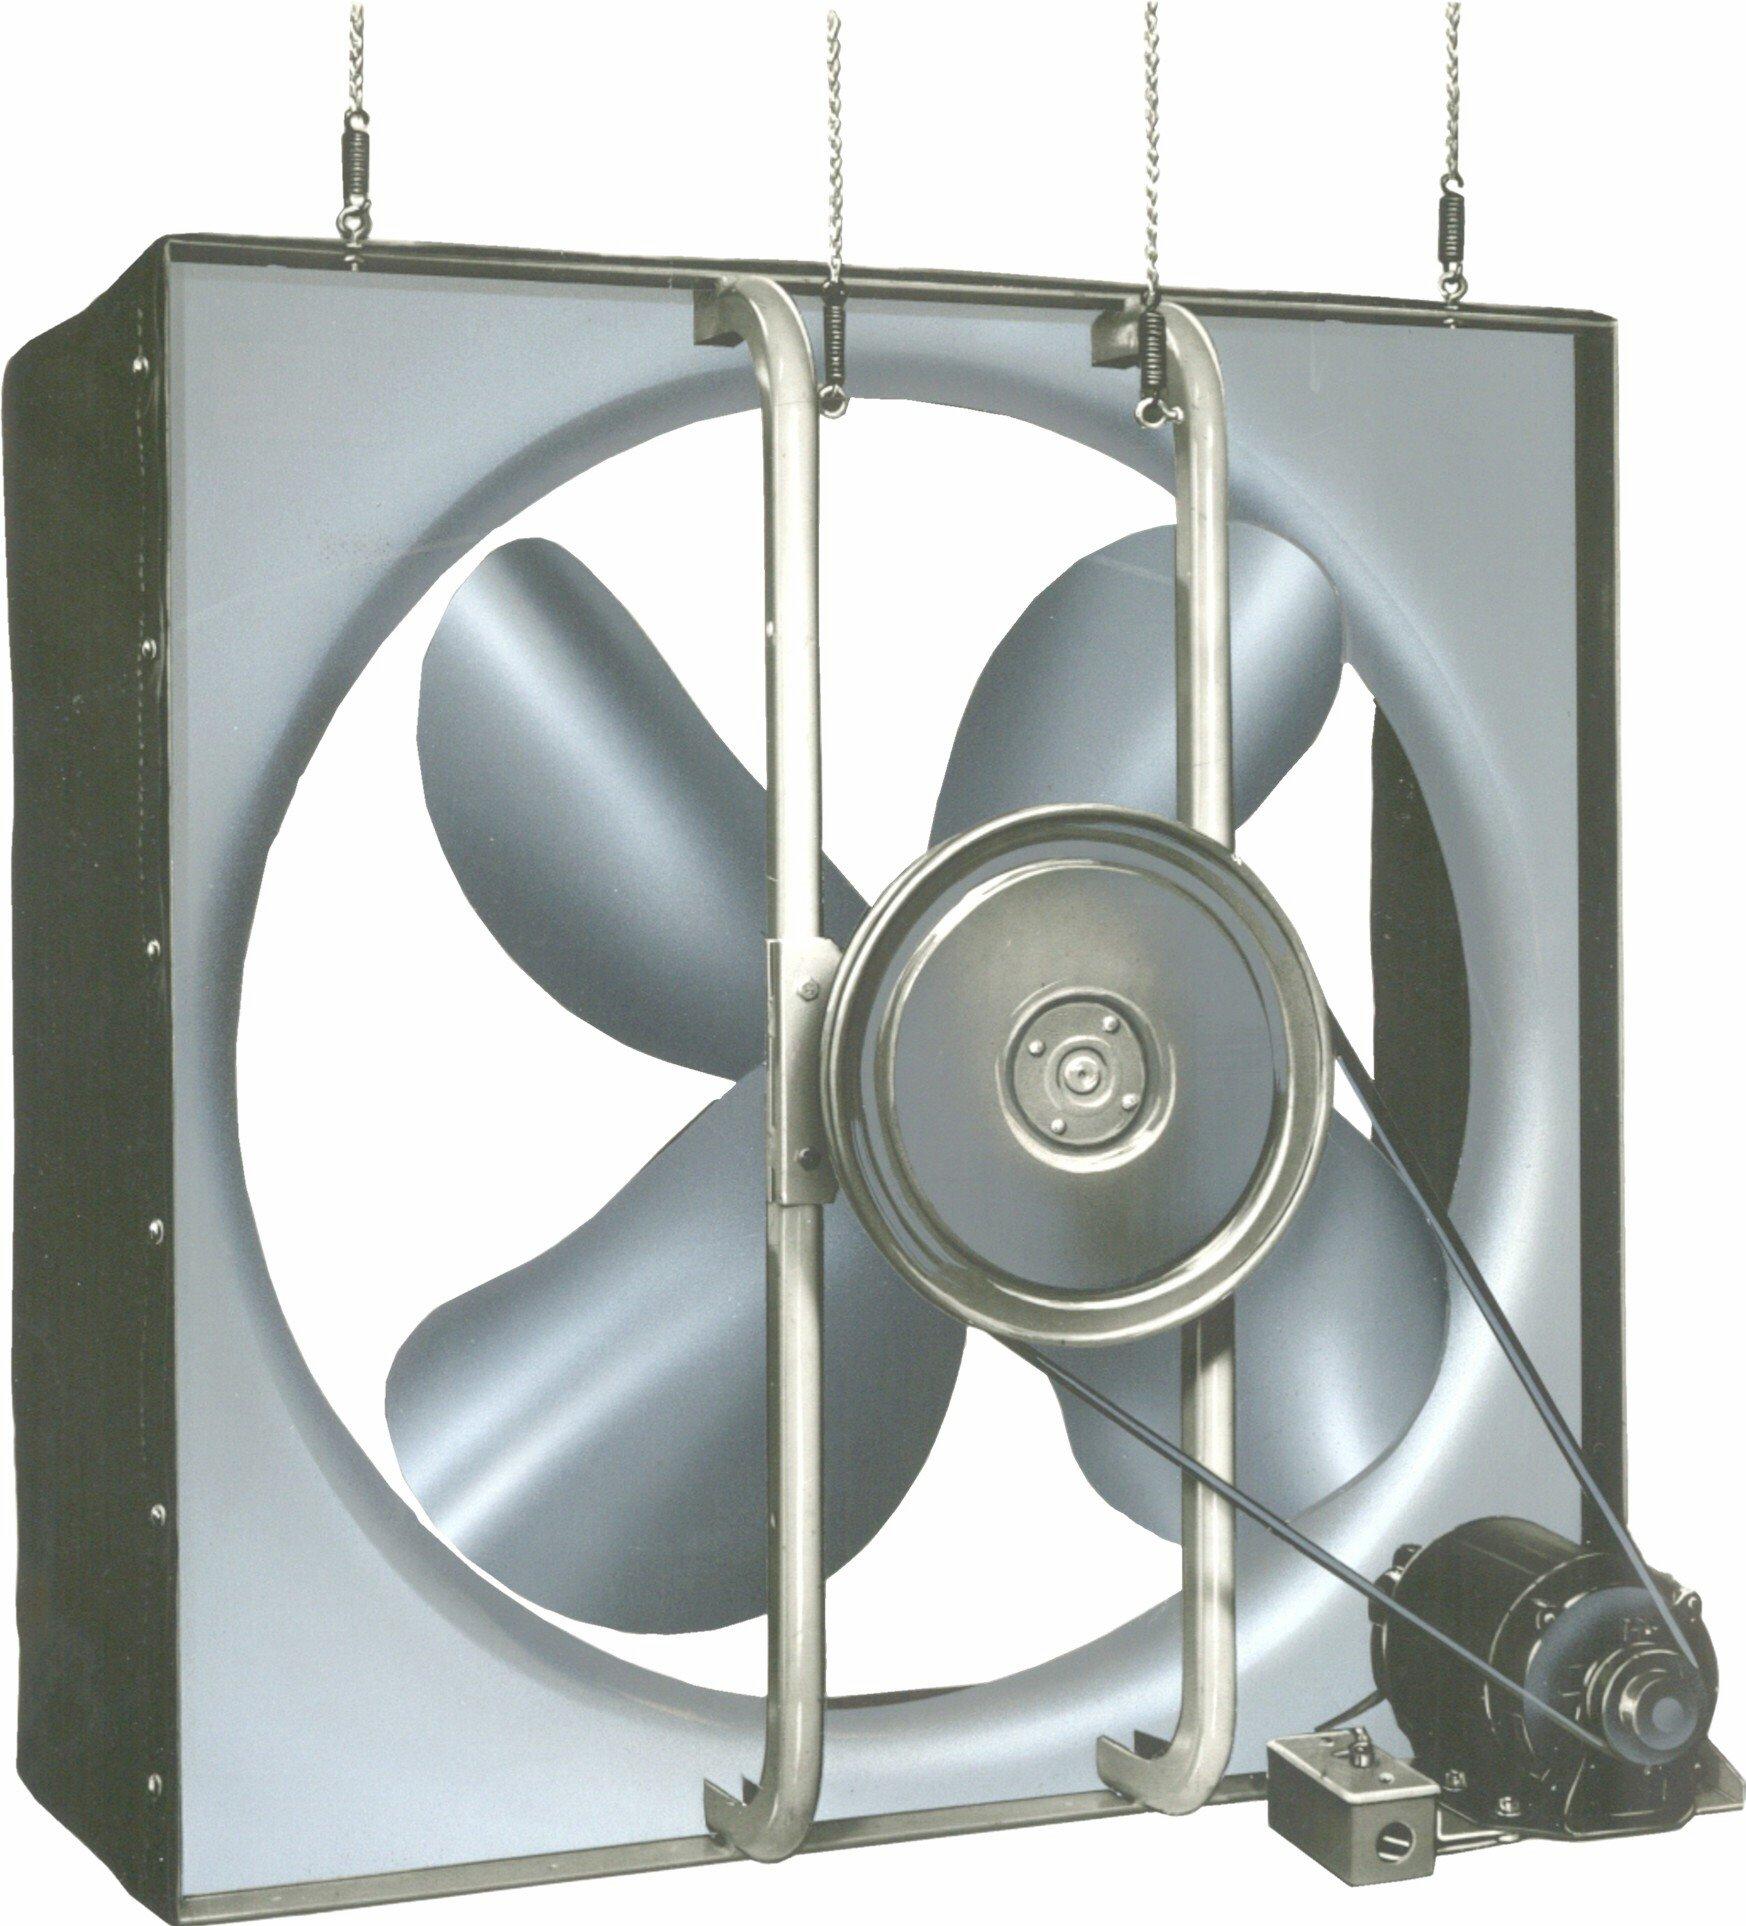 Airmaster 32688 Whole House Fan, 2 Speed, Semi-Enclosed Motor, 30'' Prop Diameter, 115V, 1/3HP Motor